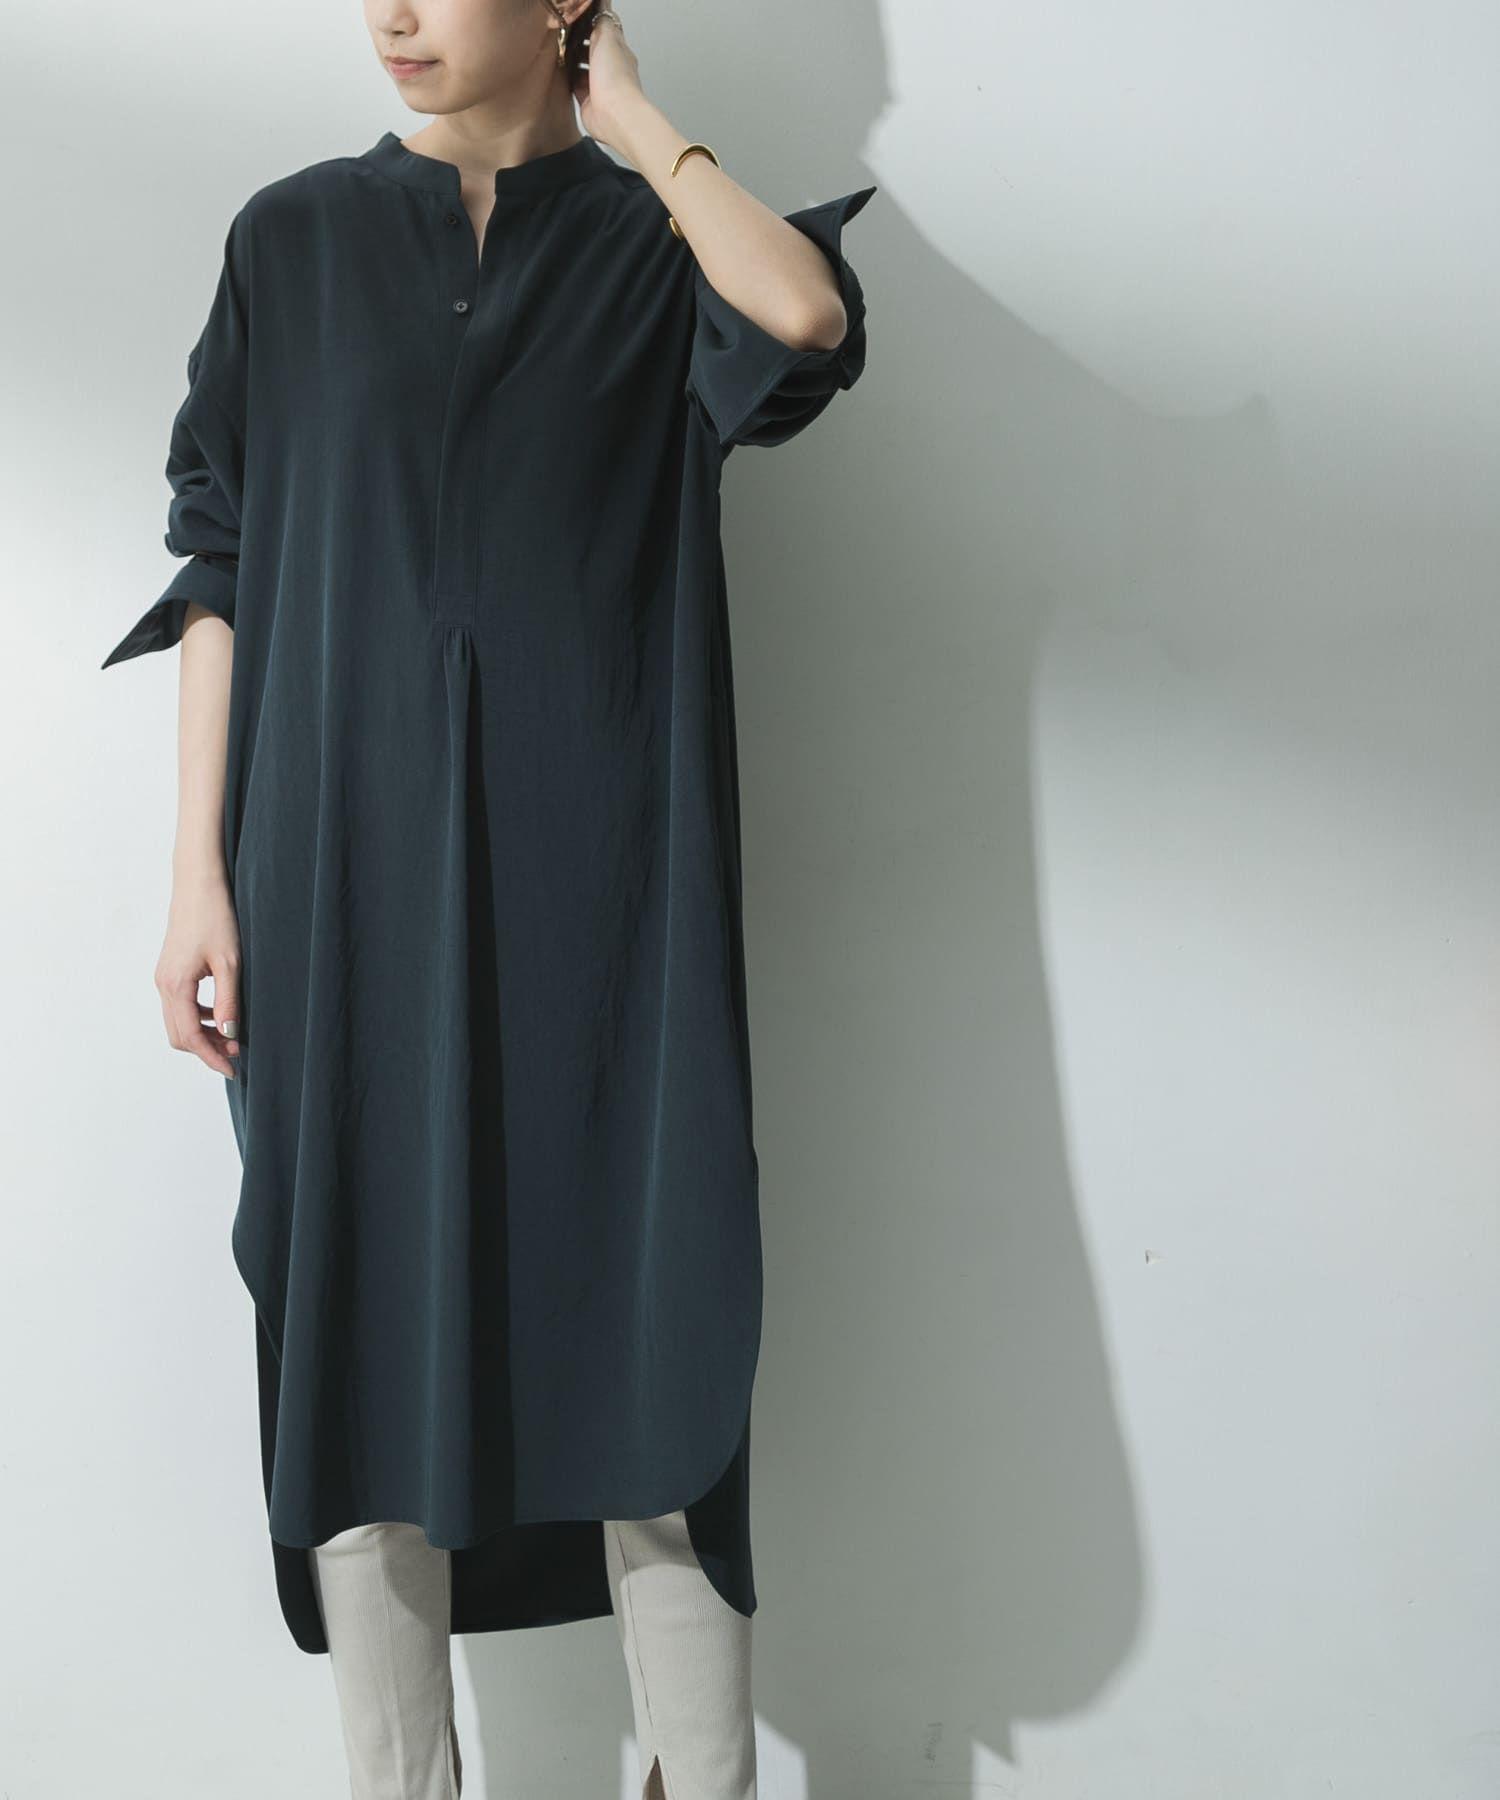 08sircus vintagecrape bandcollarshirts ps20sl dr02ul04 urban research公式ファッション通販 ファッション マキシドレス ワンピース